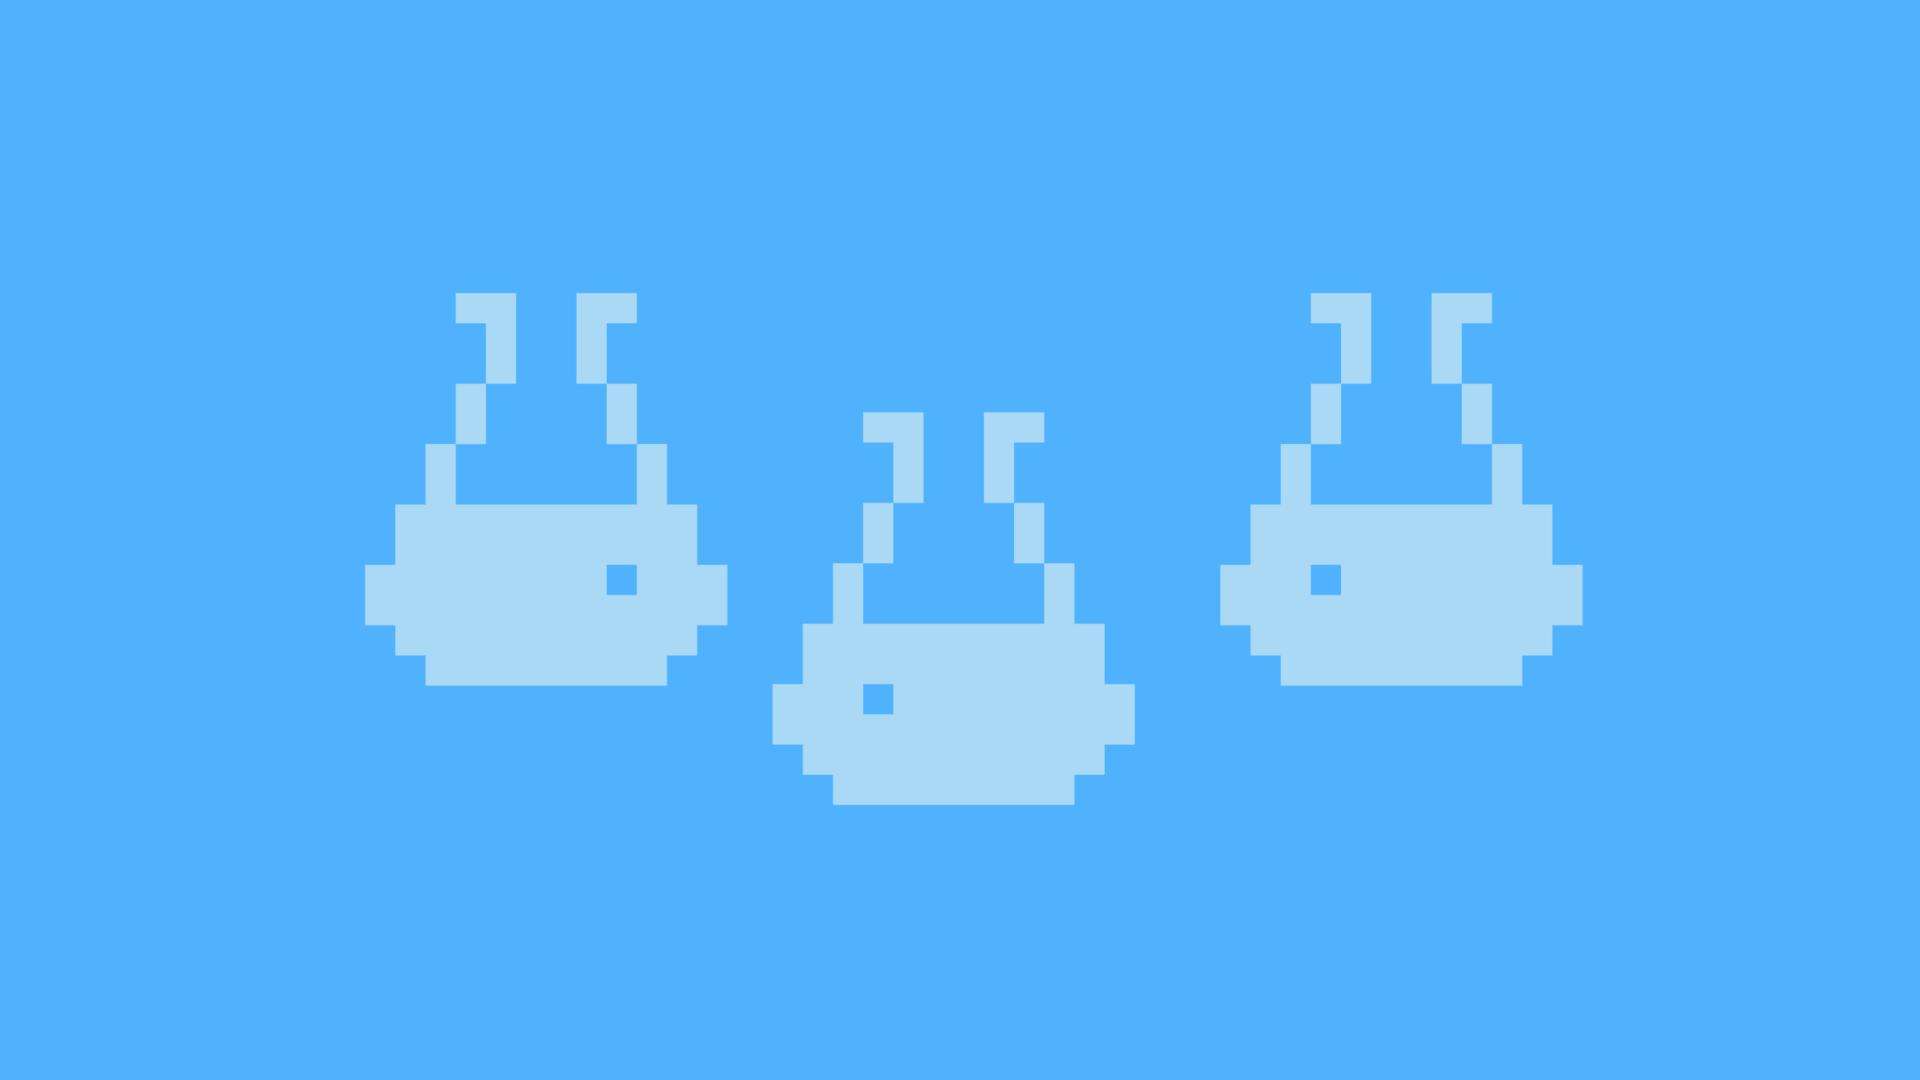 Pixelfigurer på blå bakgrund